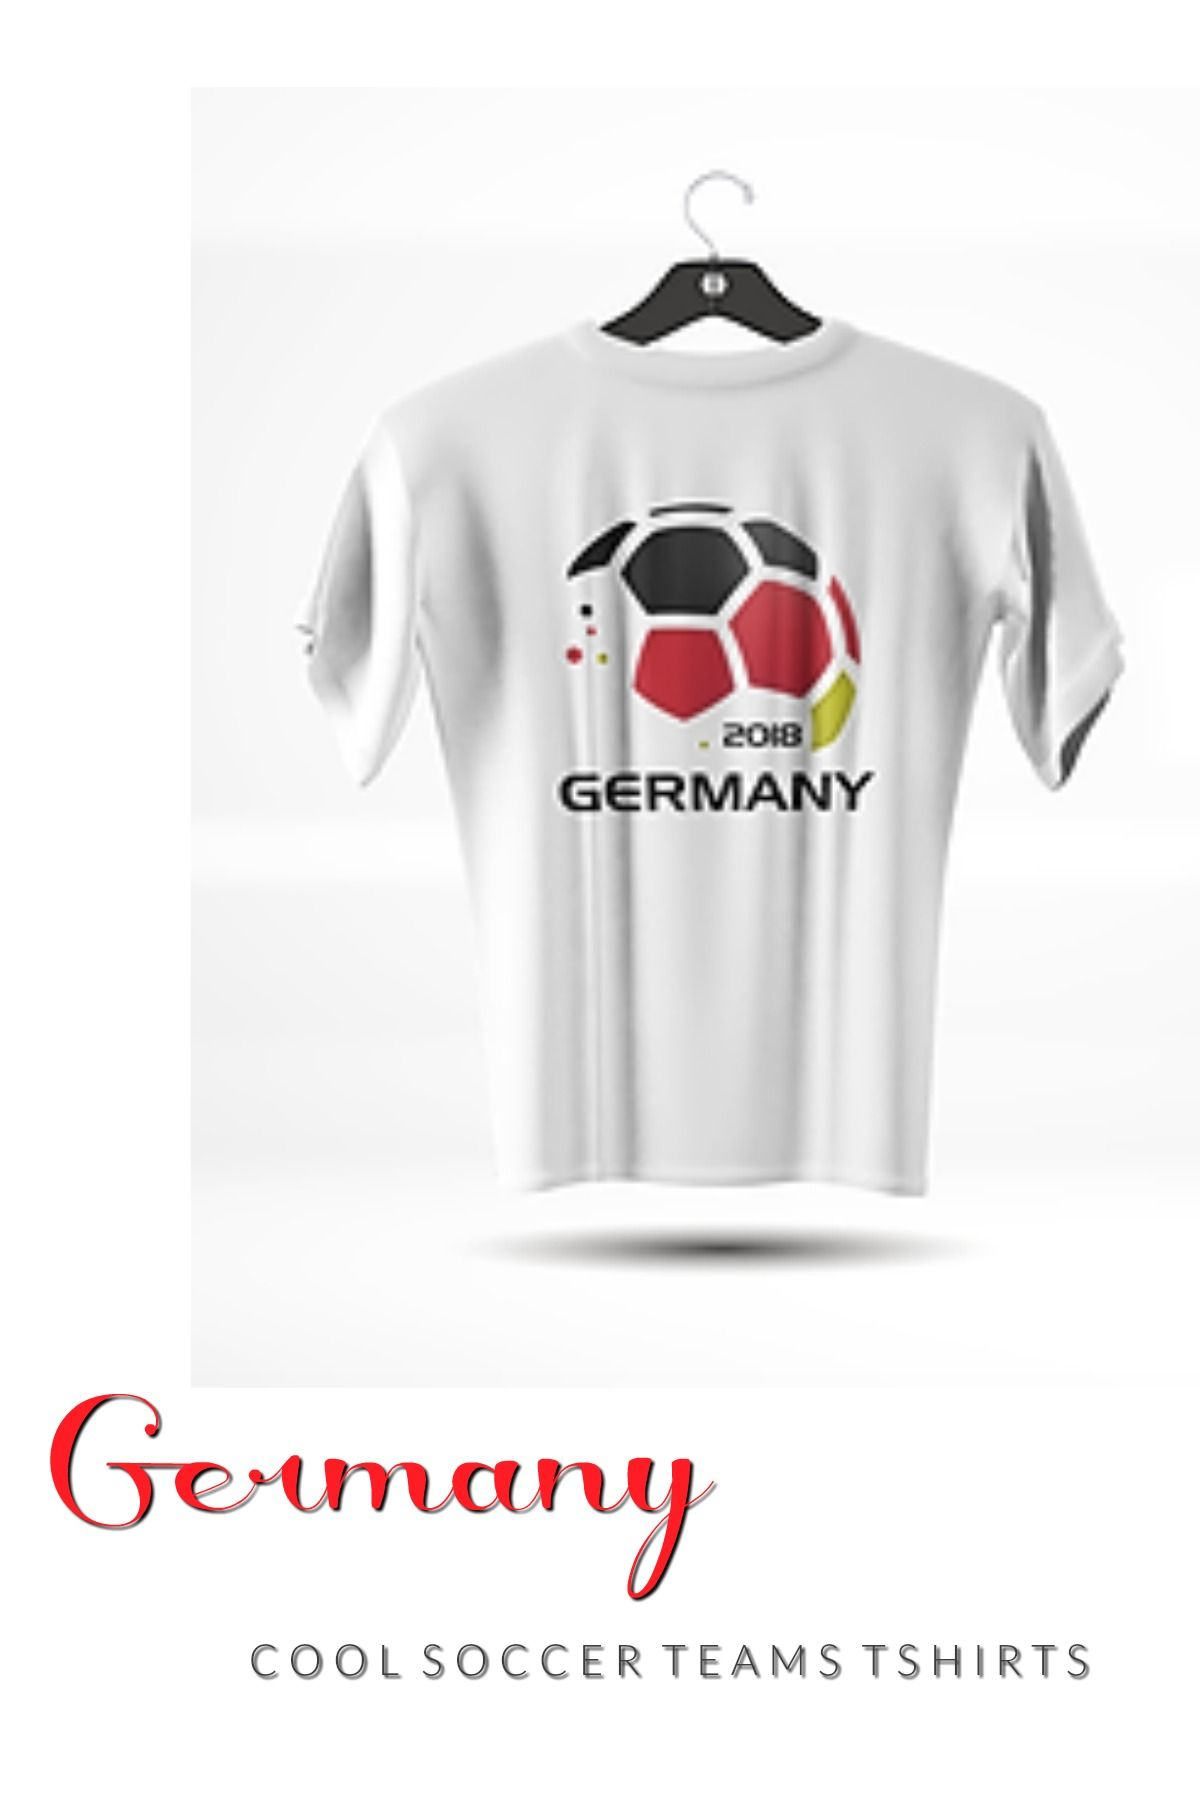 8a8bc7836 Germany Soccer Fan T Shirt - Futbol Clothes Adult Teens Kids. Cool Soccer  Teams T